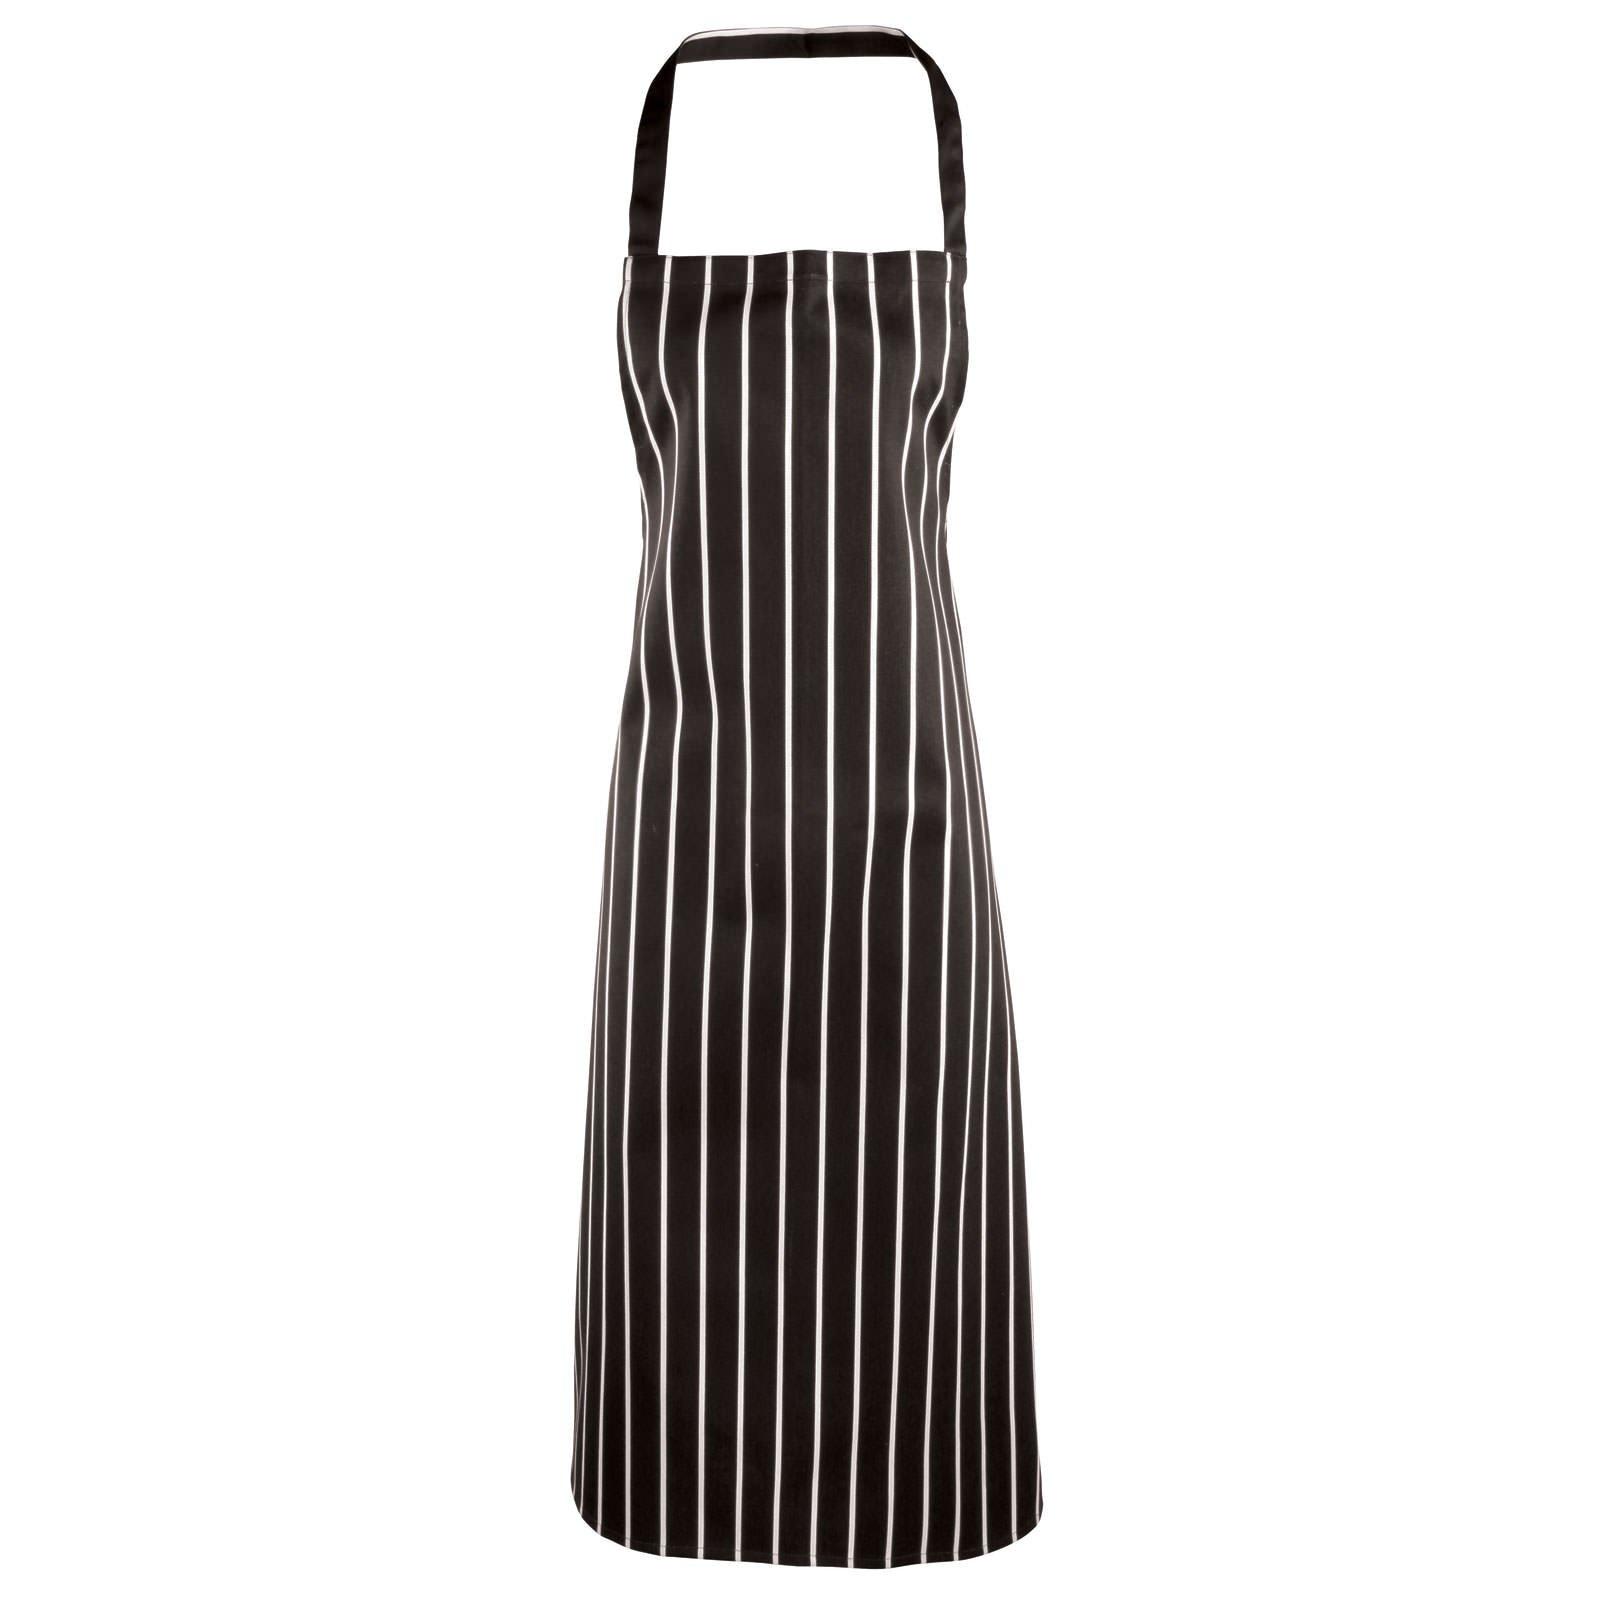 Premier Stripe Apron. - Black/Grey Fine Stripe